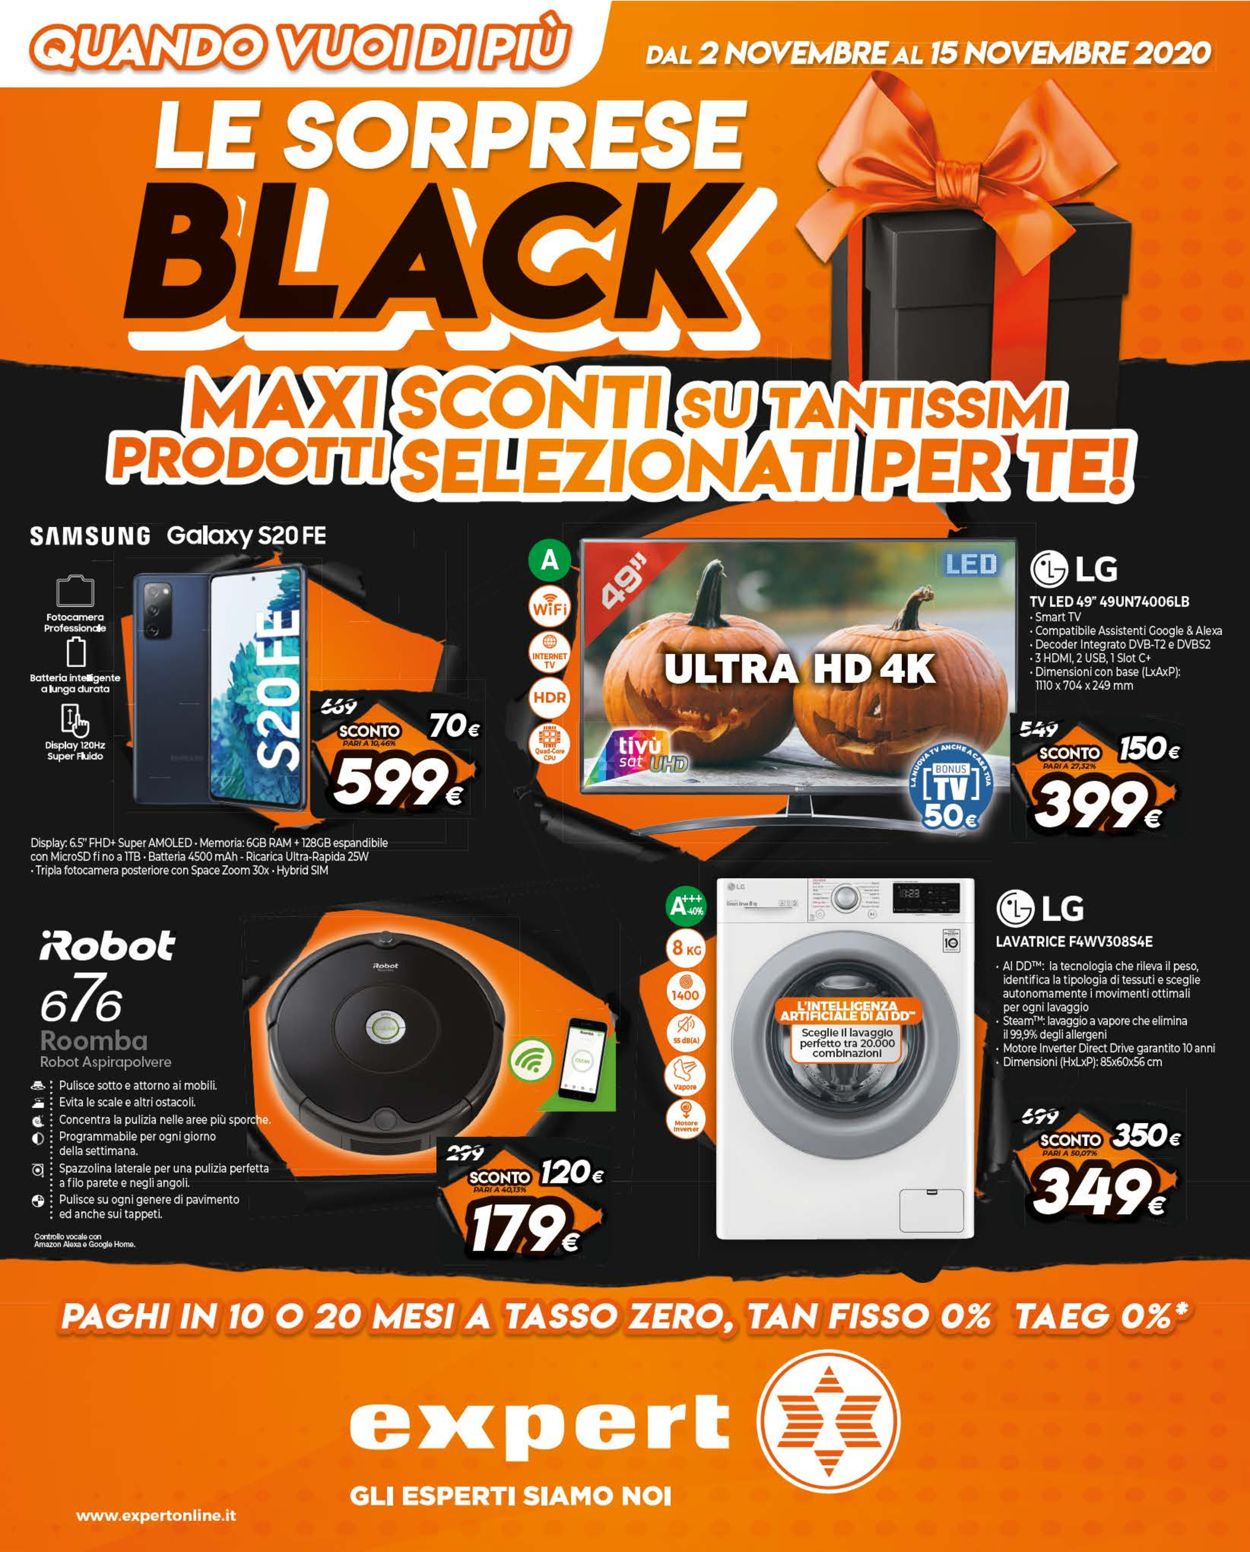 Volantino Expert - Black Friday 2020 - Offerte 02/11-15/11/2020